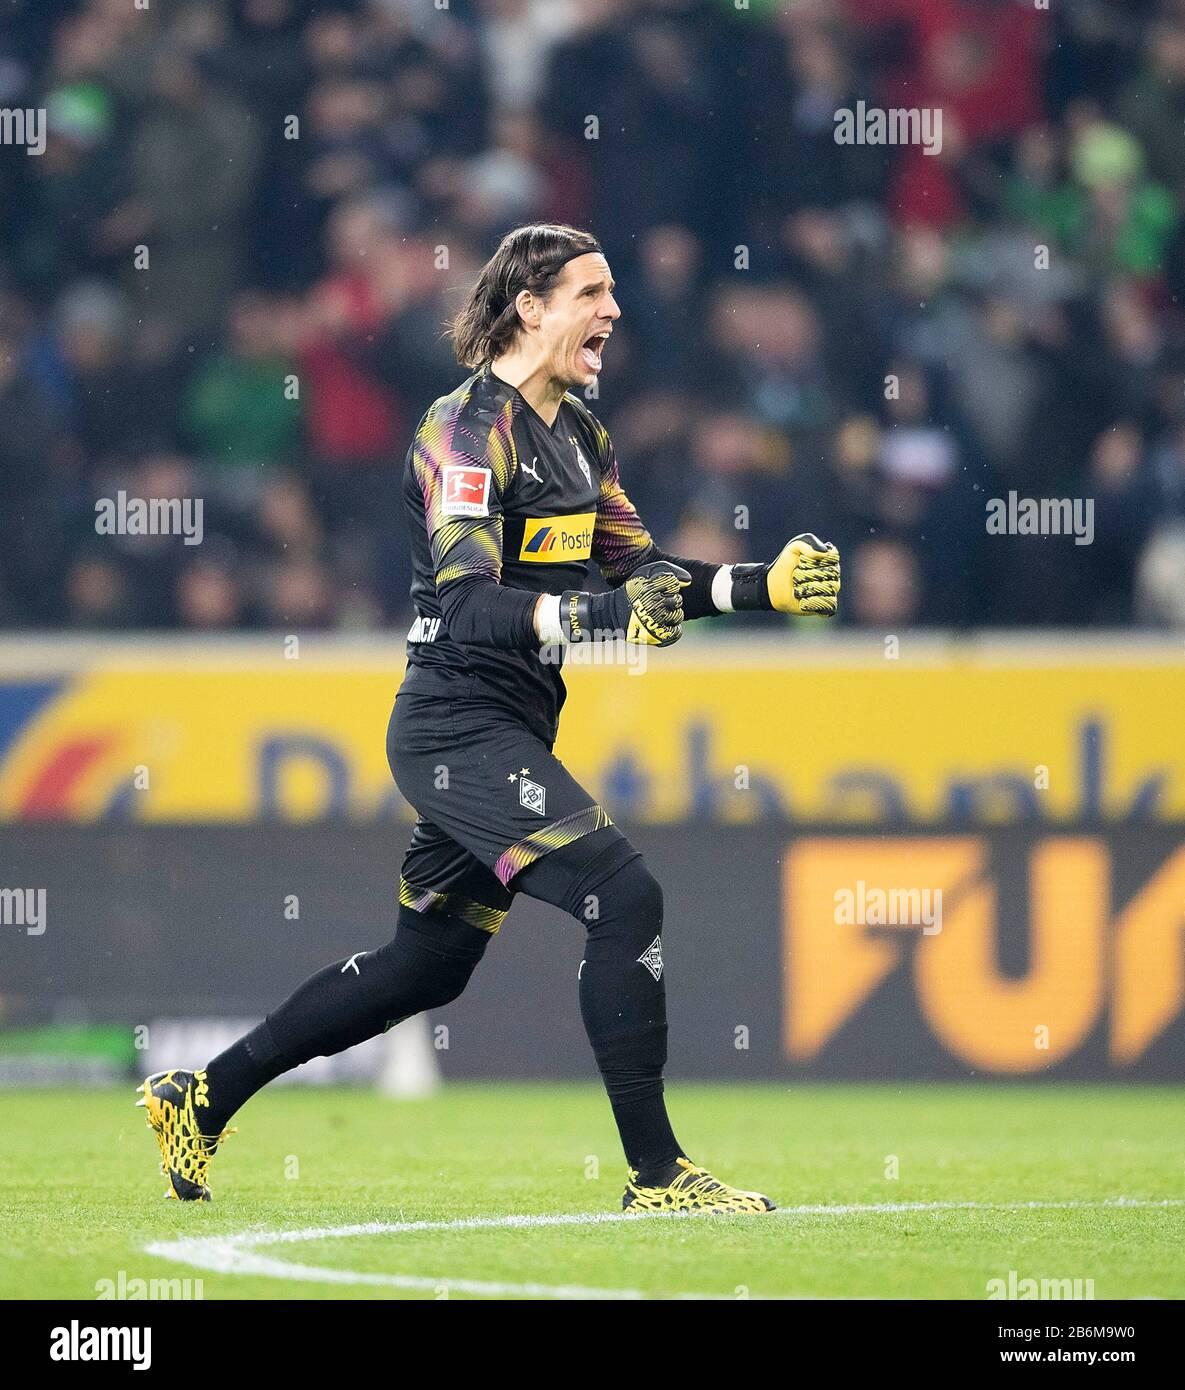 Jubilation Goalwart Yann Sommer Mg Soccer 1 Bundesliga 25th Matchday Borussia Monchengladbach Mg Borussia Dortmund Do 1 2 On March 7th 2020 In Borussia Monchengladbach Germany Usage Worldwide Stock Photo Alamy